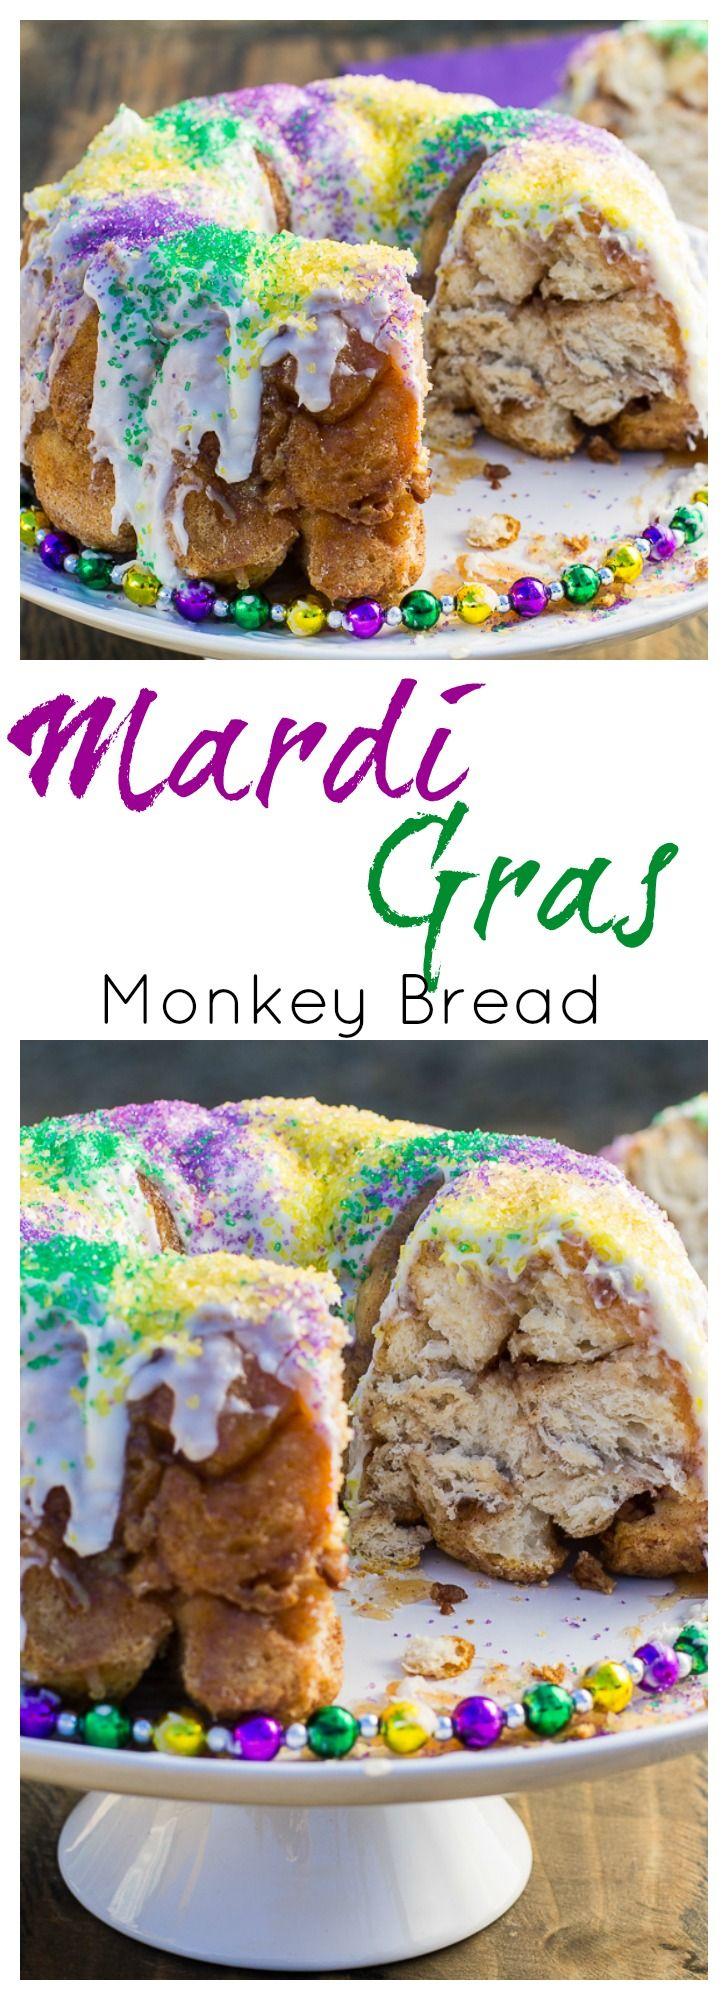 Mardi Gras Monkey Bread